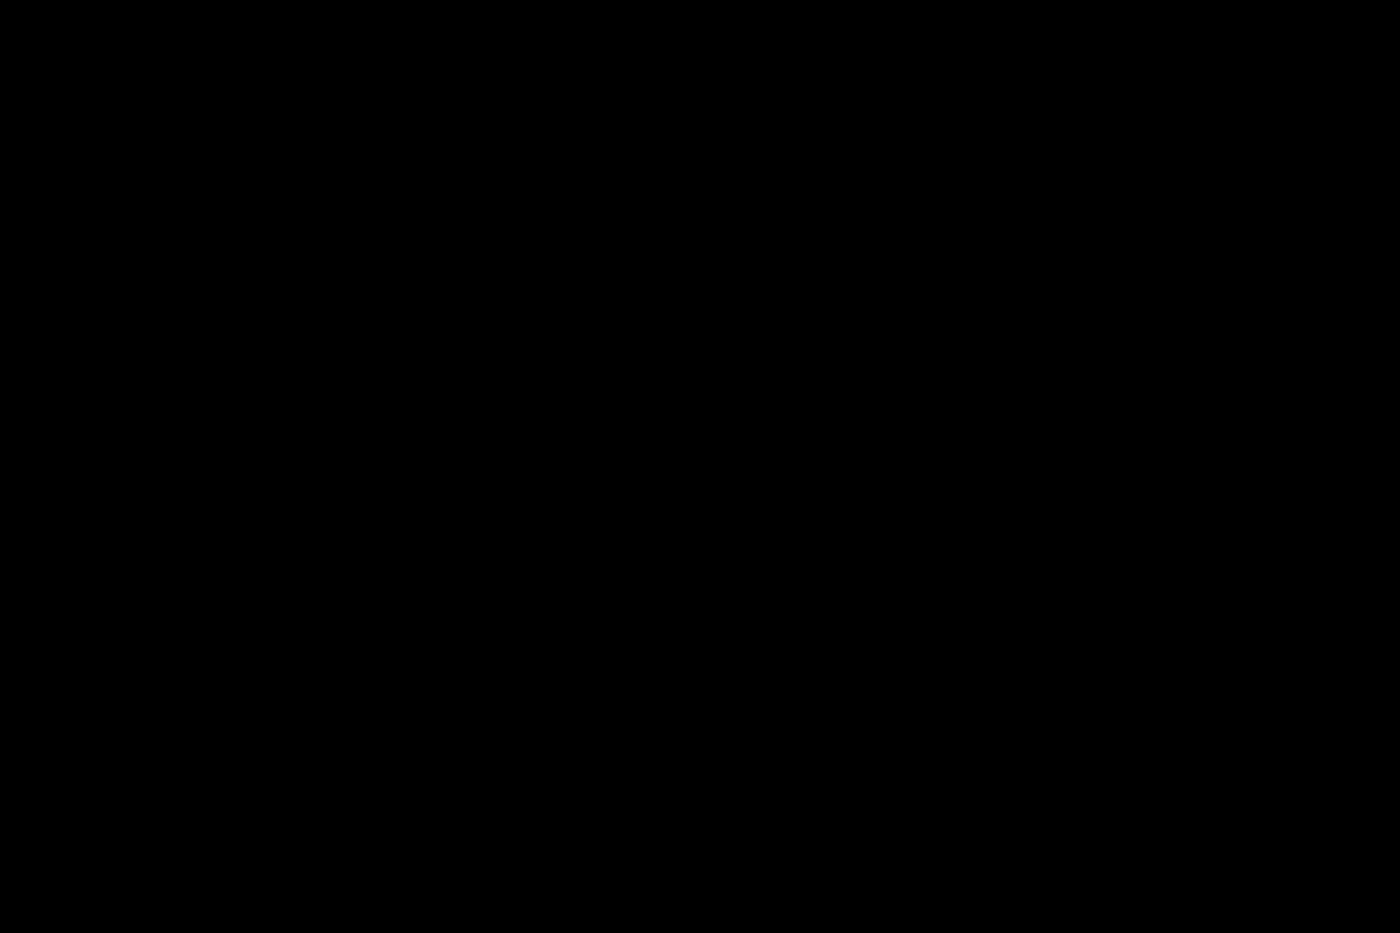 Elevgruppen